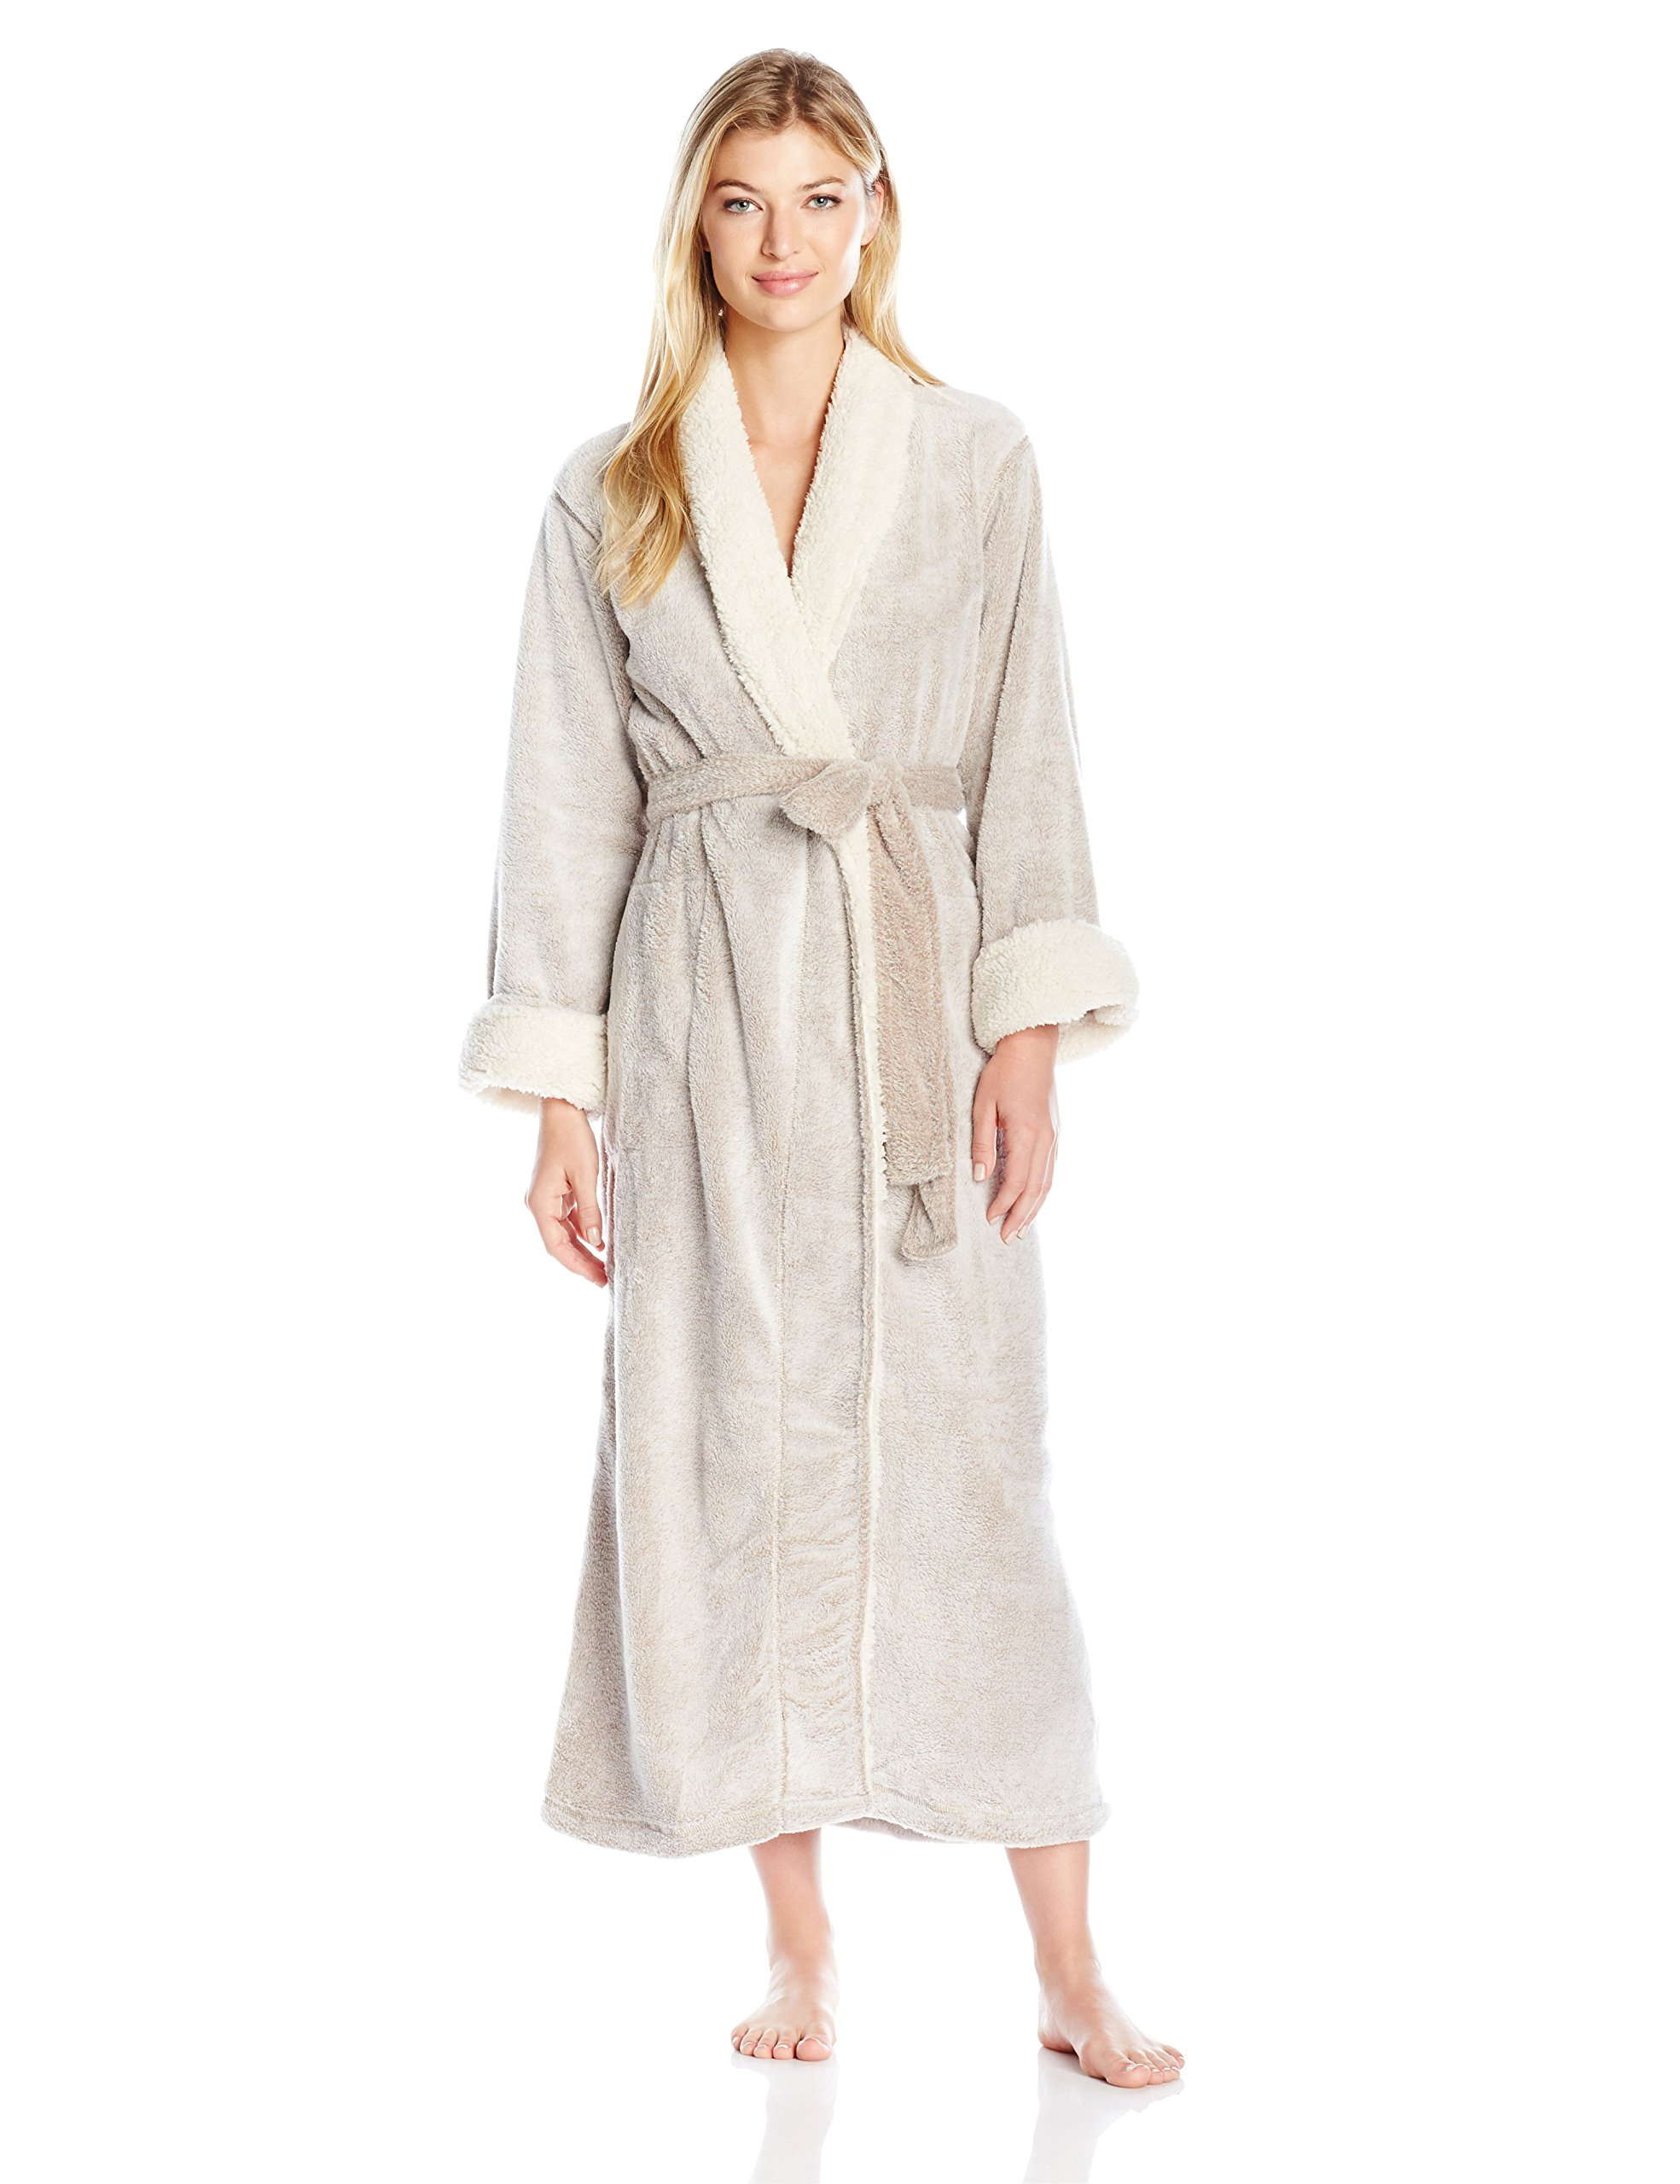 Natori Women's Sherpa Robe, Cashmere, Large